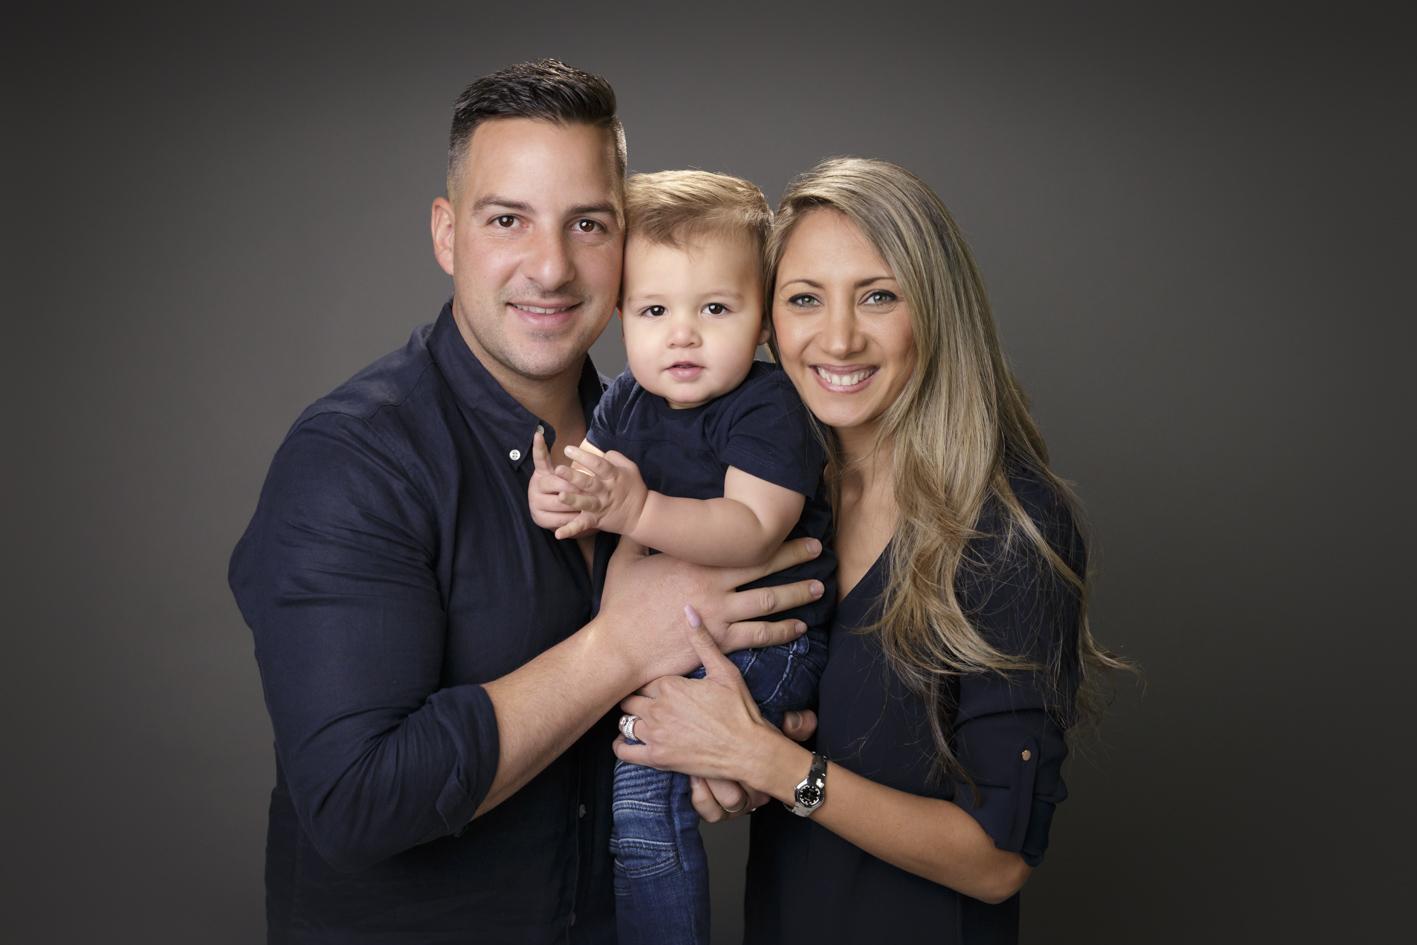 stunning family photos